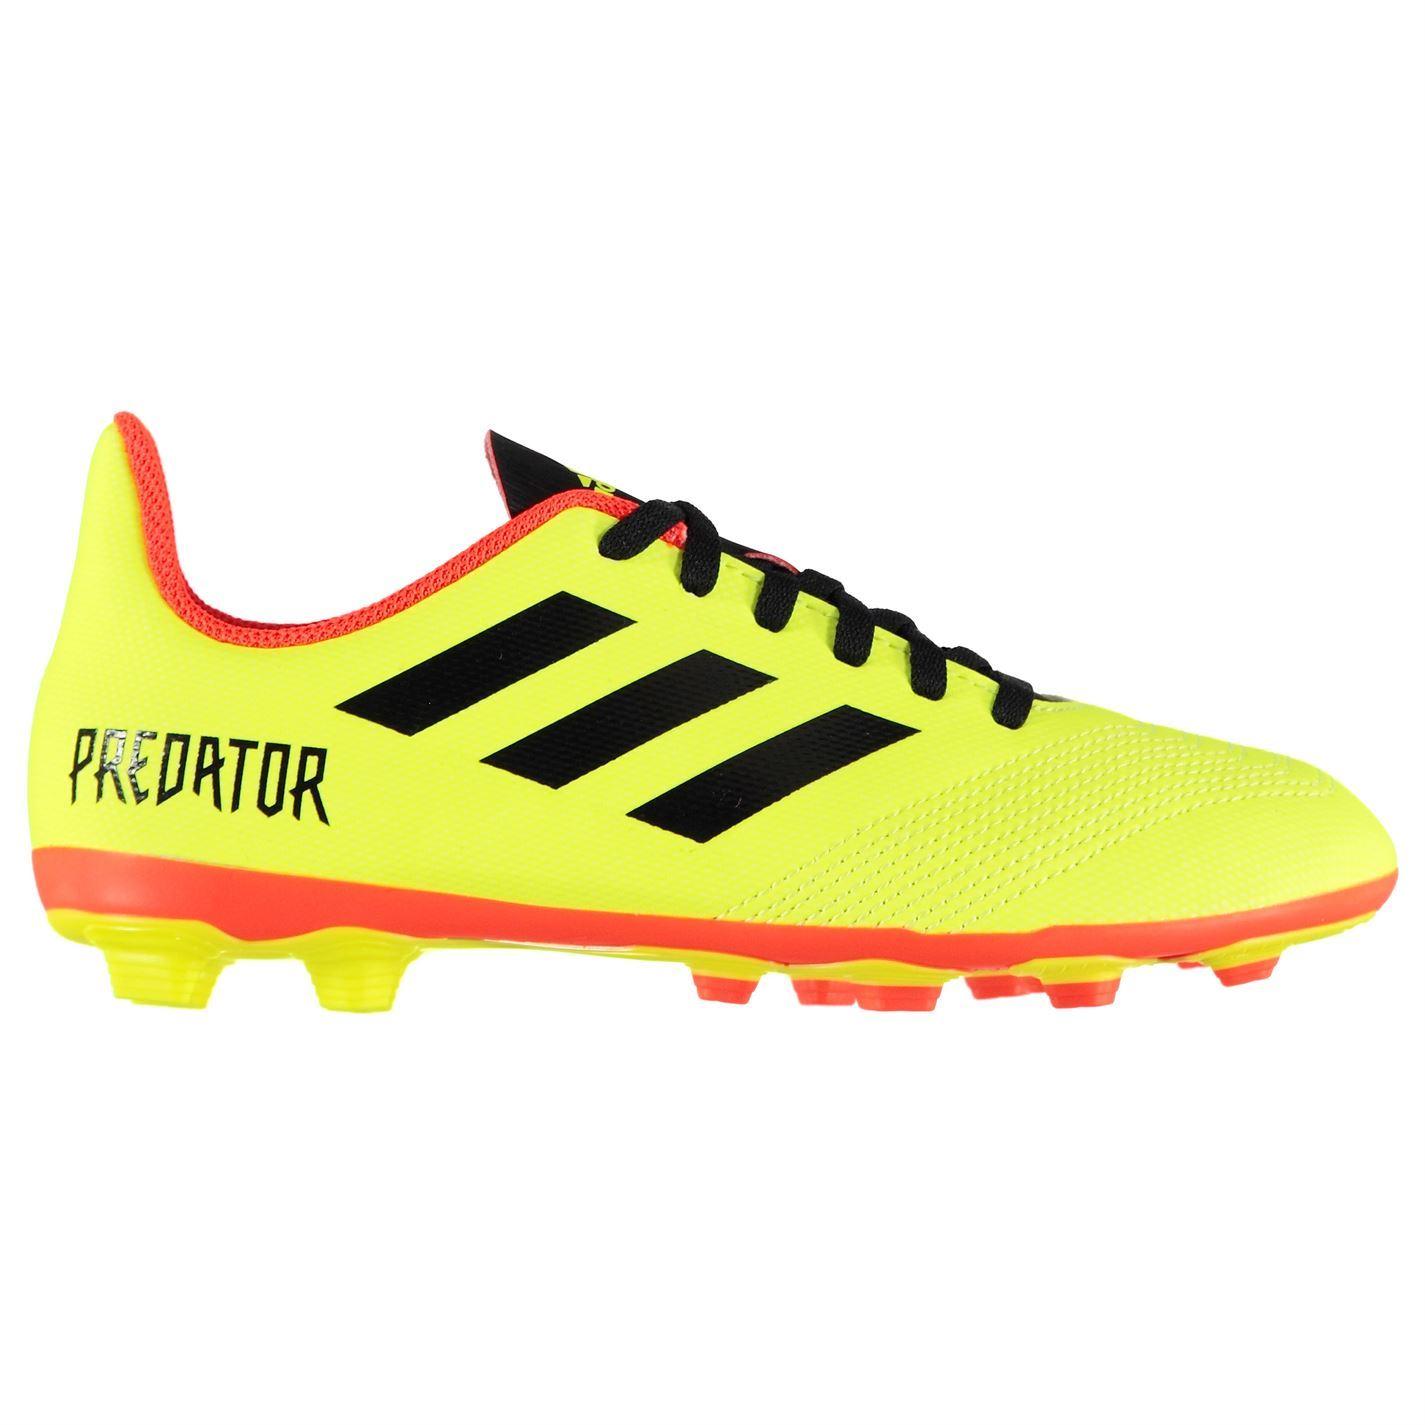 6c56c0c5e02f ... adidas Predator 18.4 Firm Ground Football Boots Juniors Yellow Soccer  Cleats ...